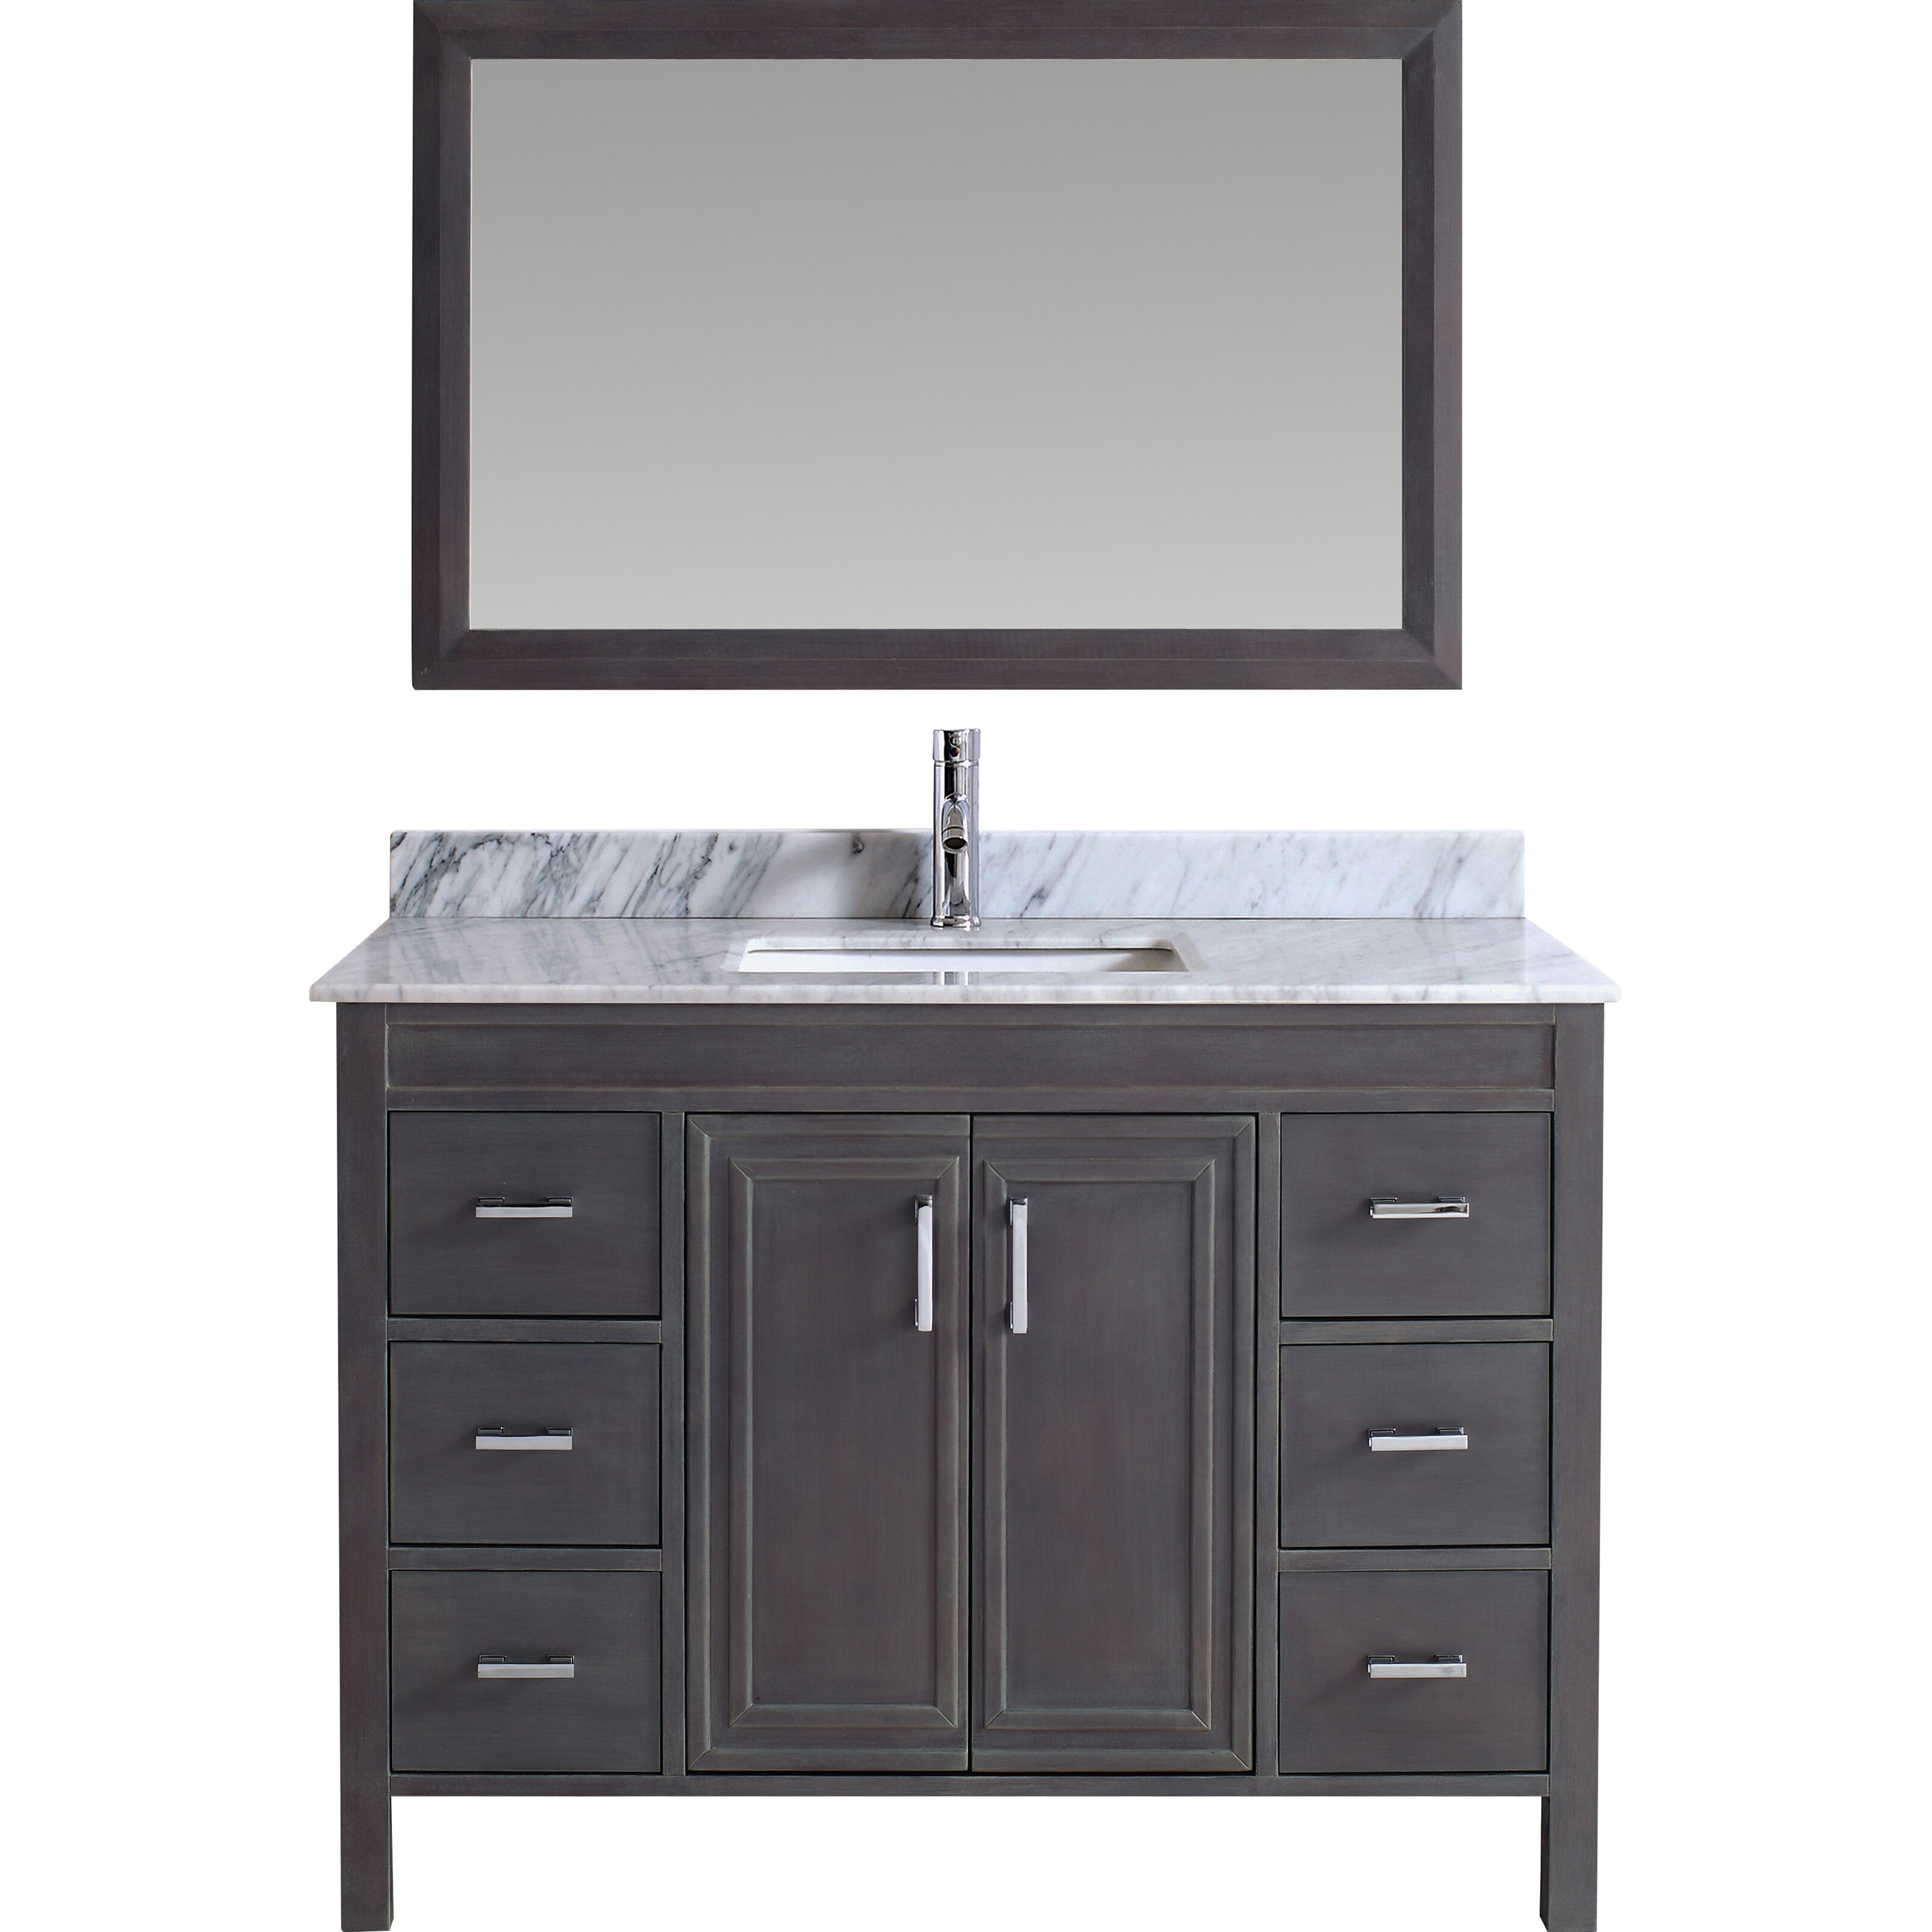 Bauhaus bath coraline 48 single bathroom vanity set with for Bath and vanity set